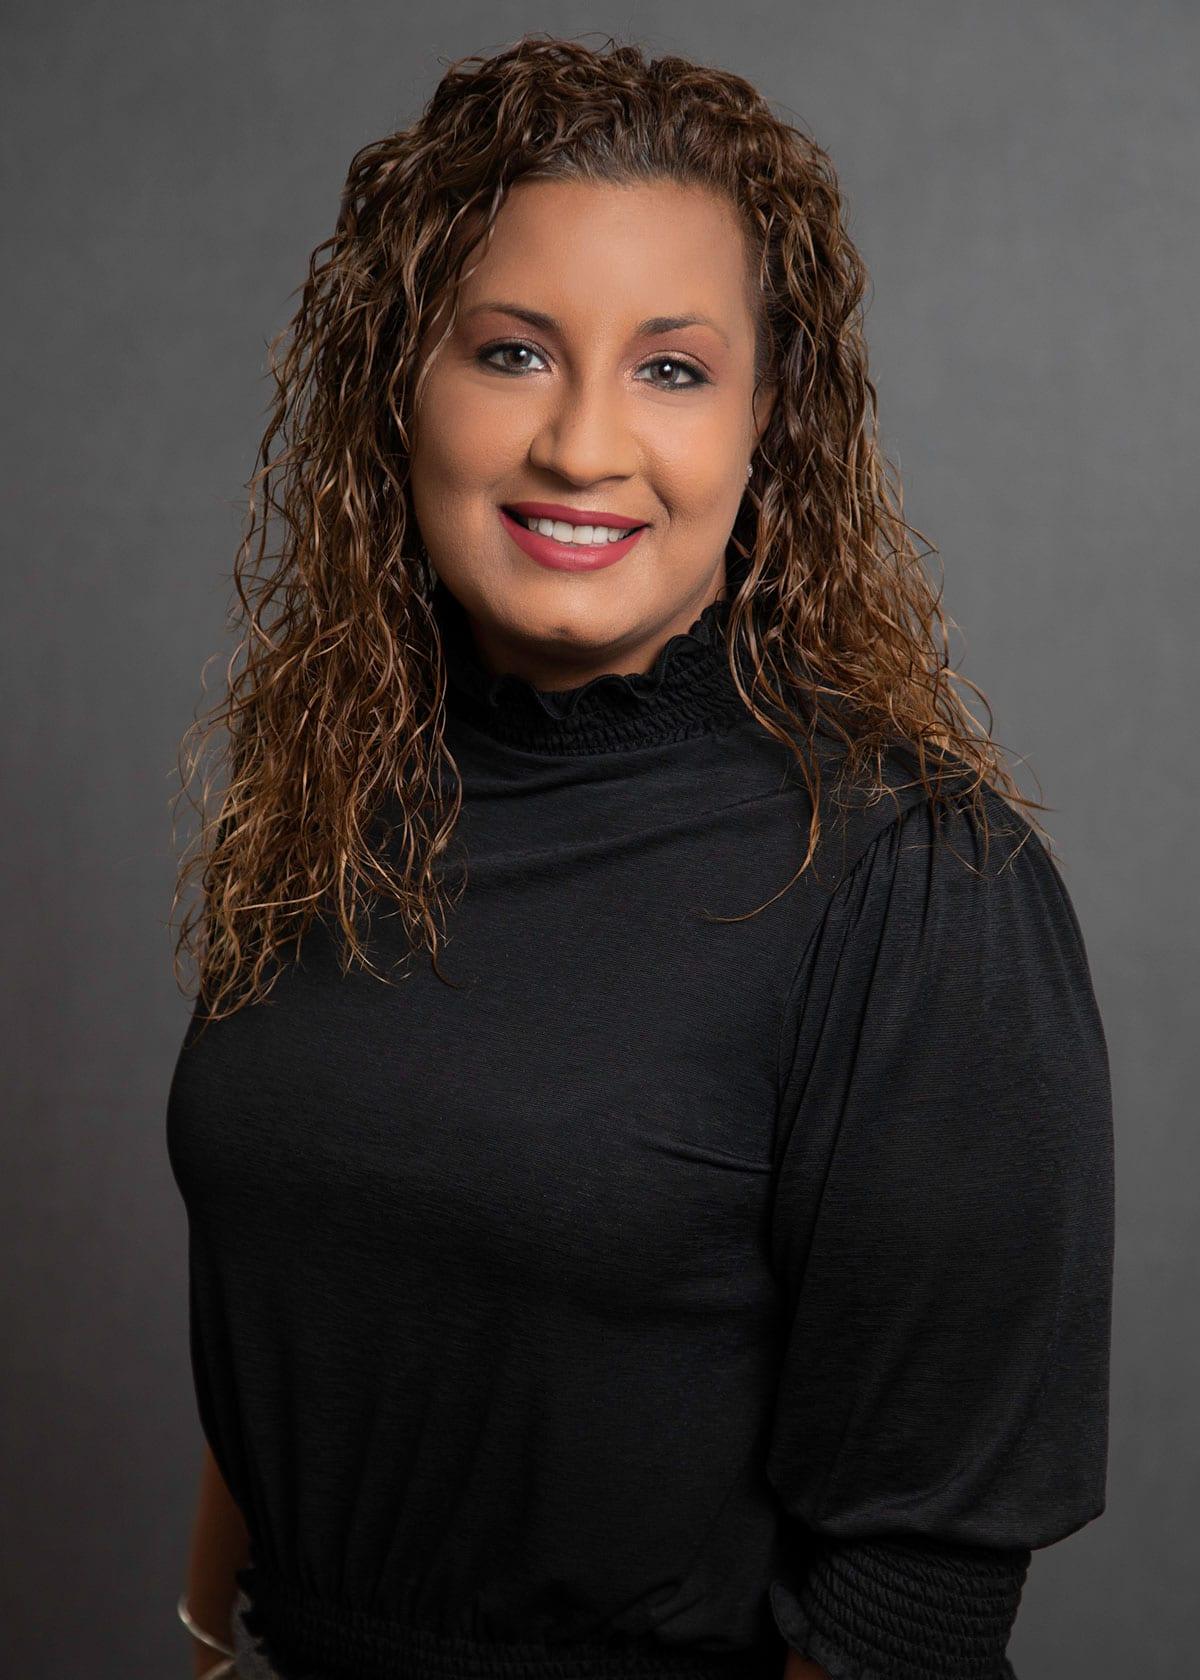 Jannette Rivera